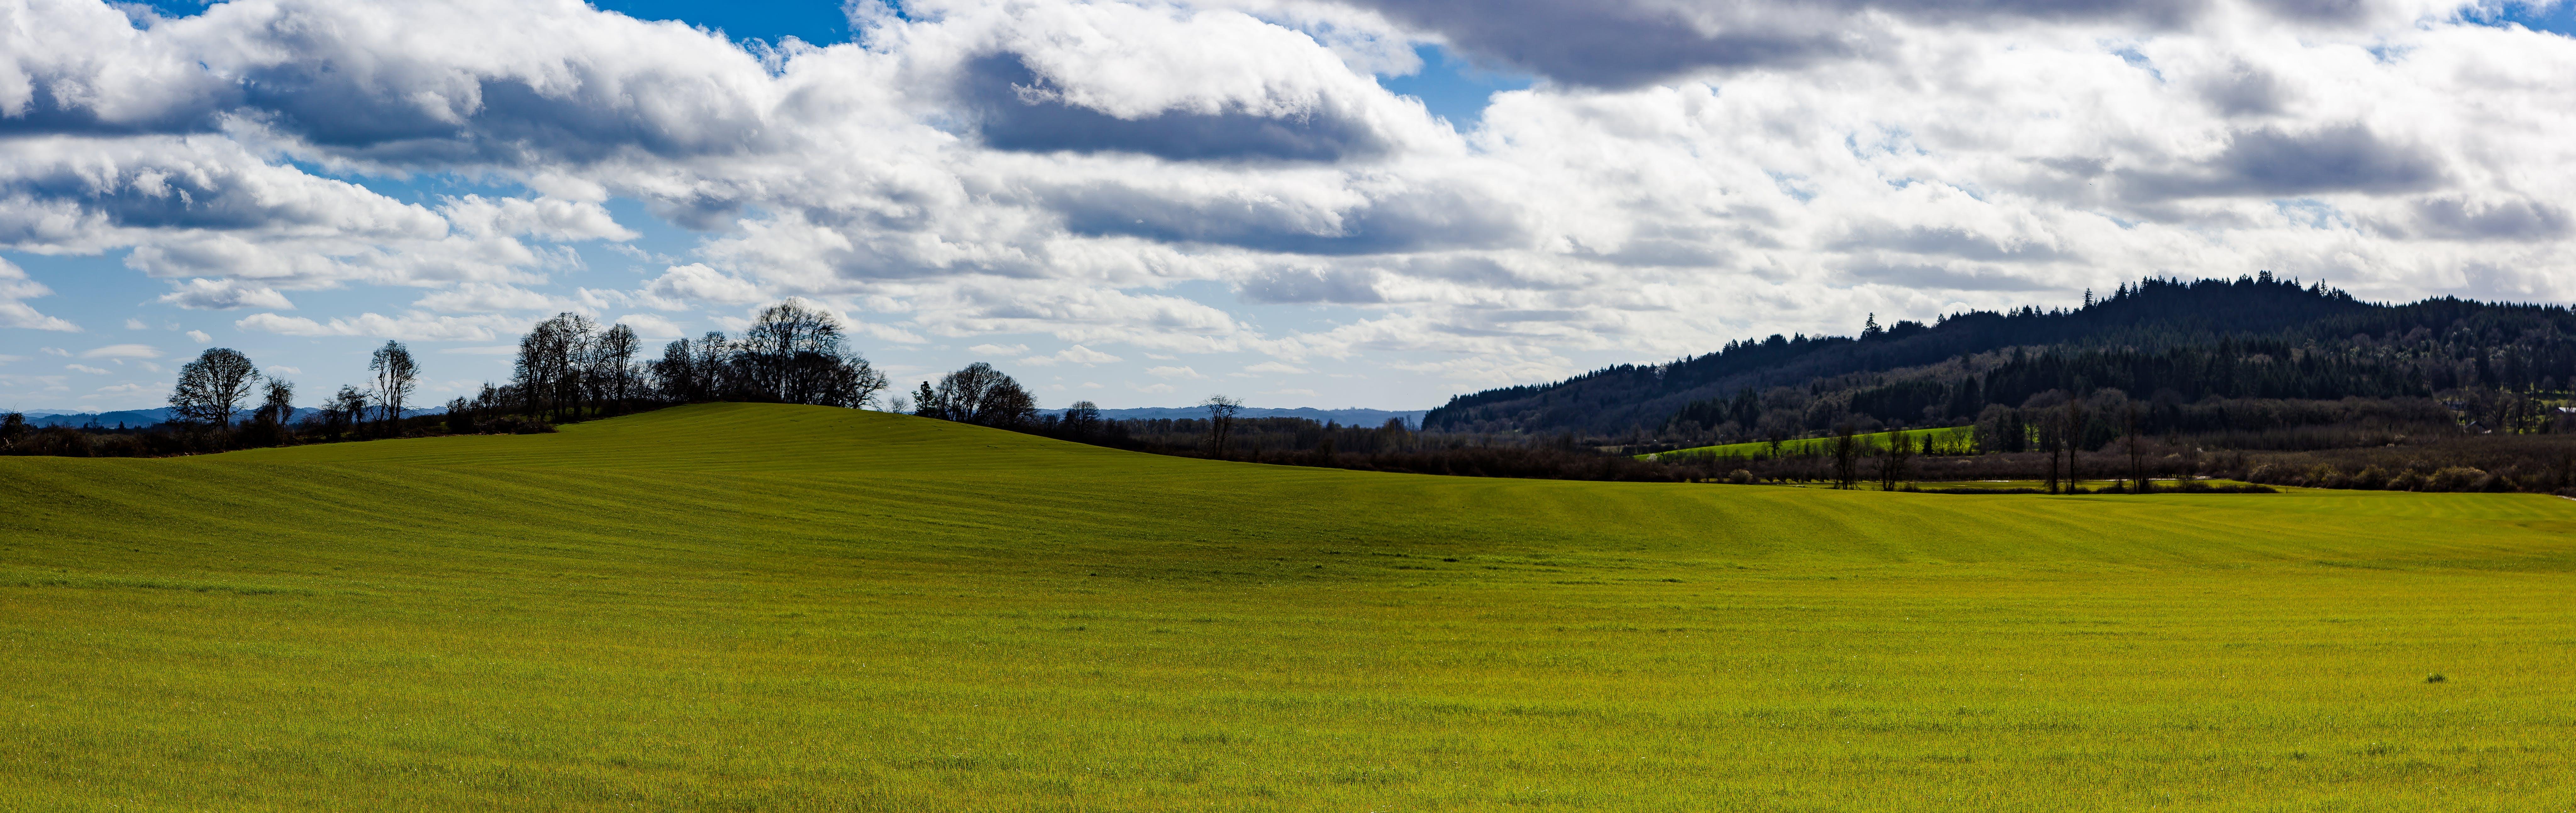 Free stock photo of grass field